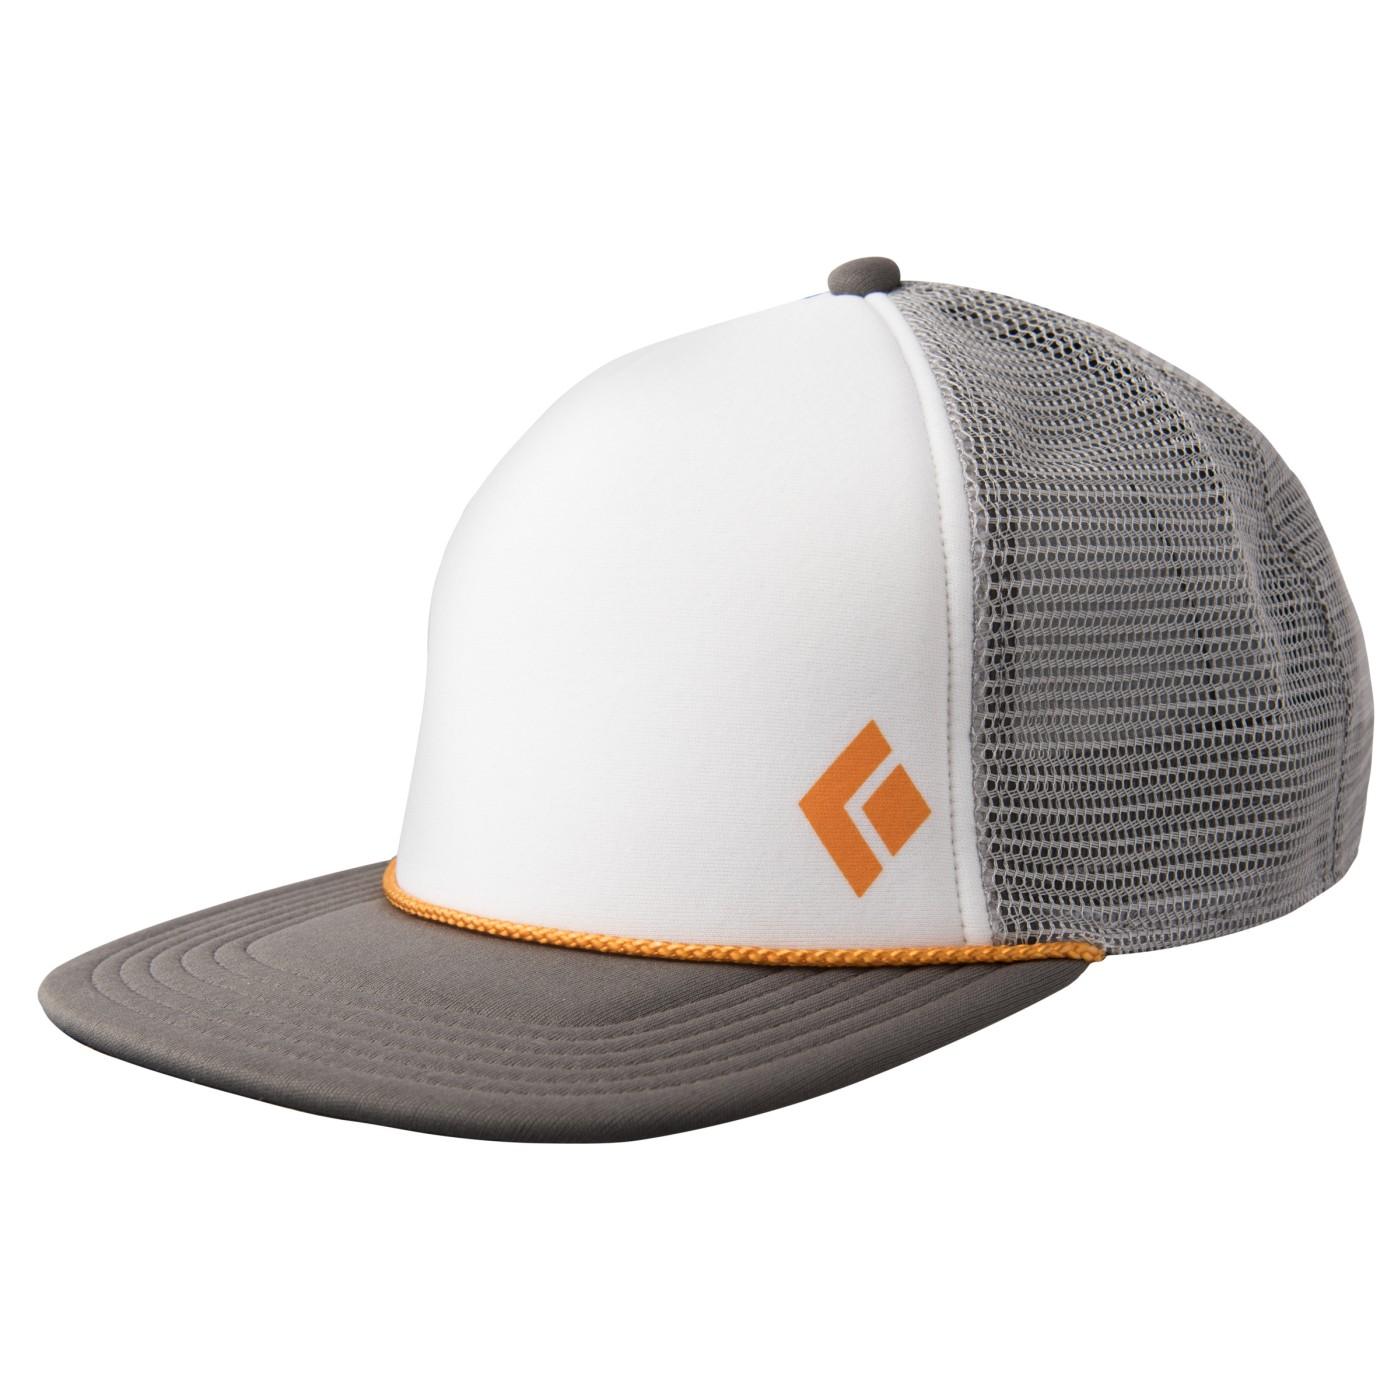 e2c5ad0f4eb18 Black Diamond Flat Bill Trucker Hat Granite-White - us